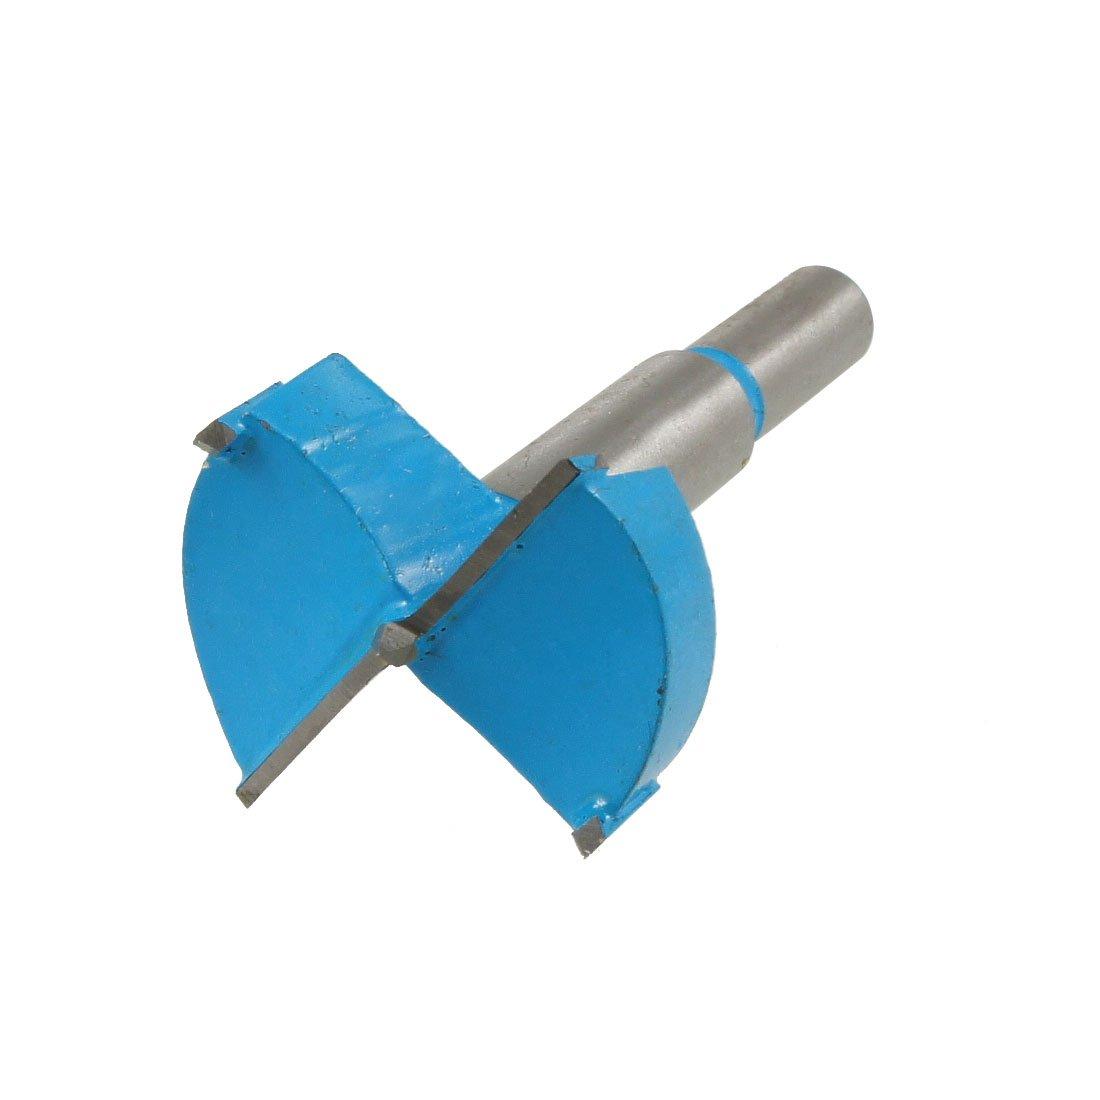 Sourcingmap a12091300ux0290 42 mm Diameter Carpentry Forstner Tip Hinge Boring Bit Drilling Tool